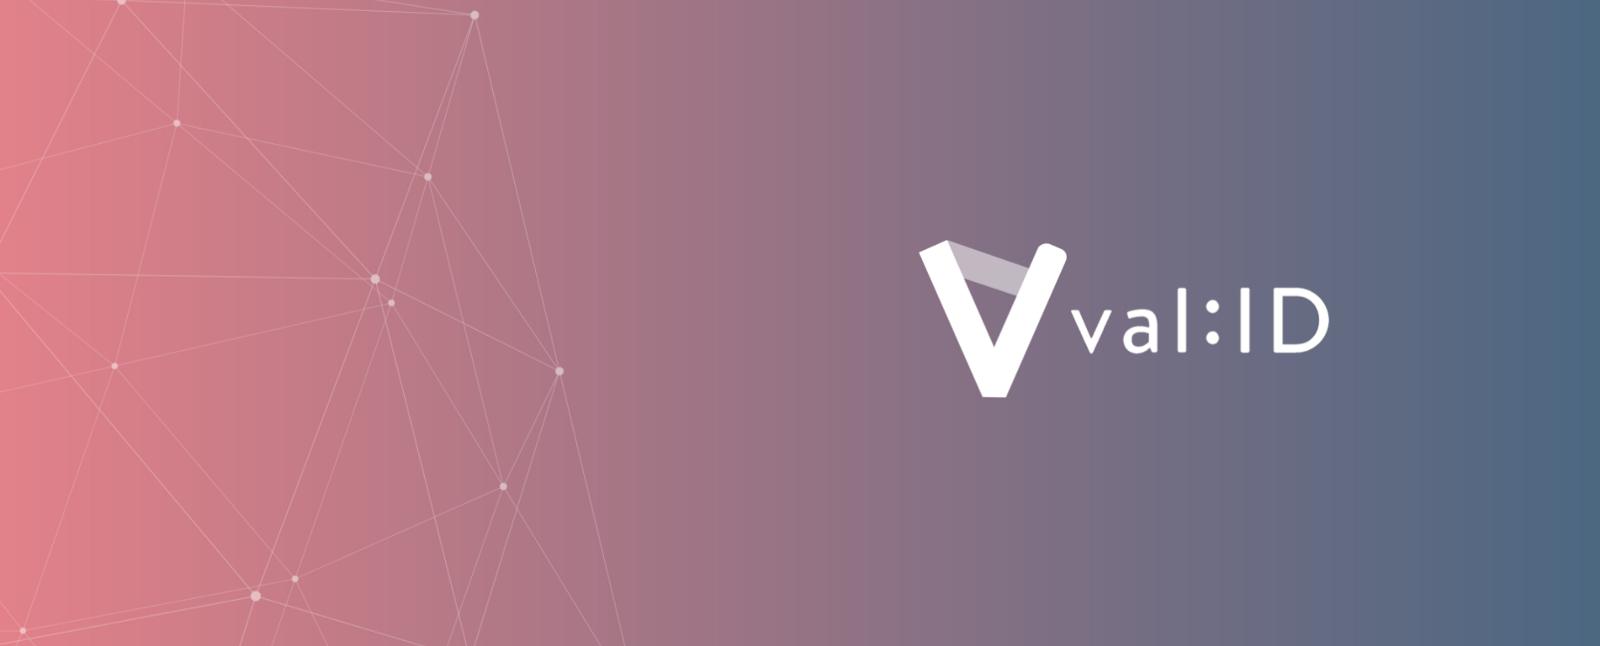 VALID | VLD | VALID Token Sale